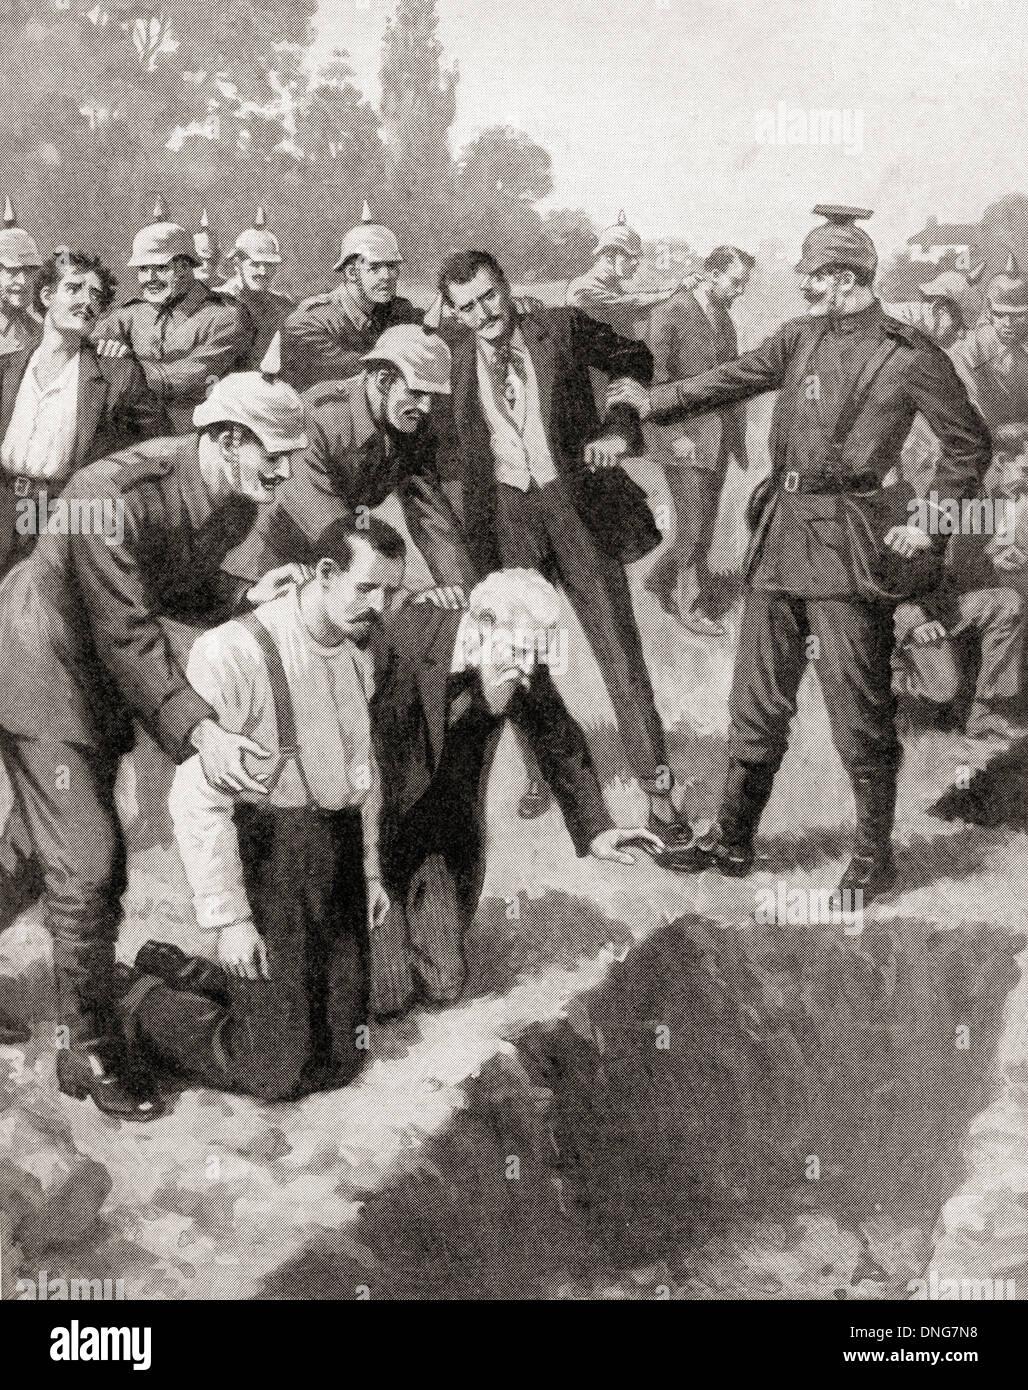 German atrocity in Senlis, France during WWI. - Stock Image